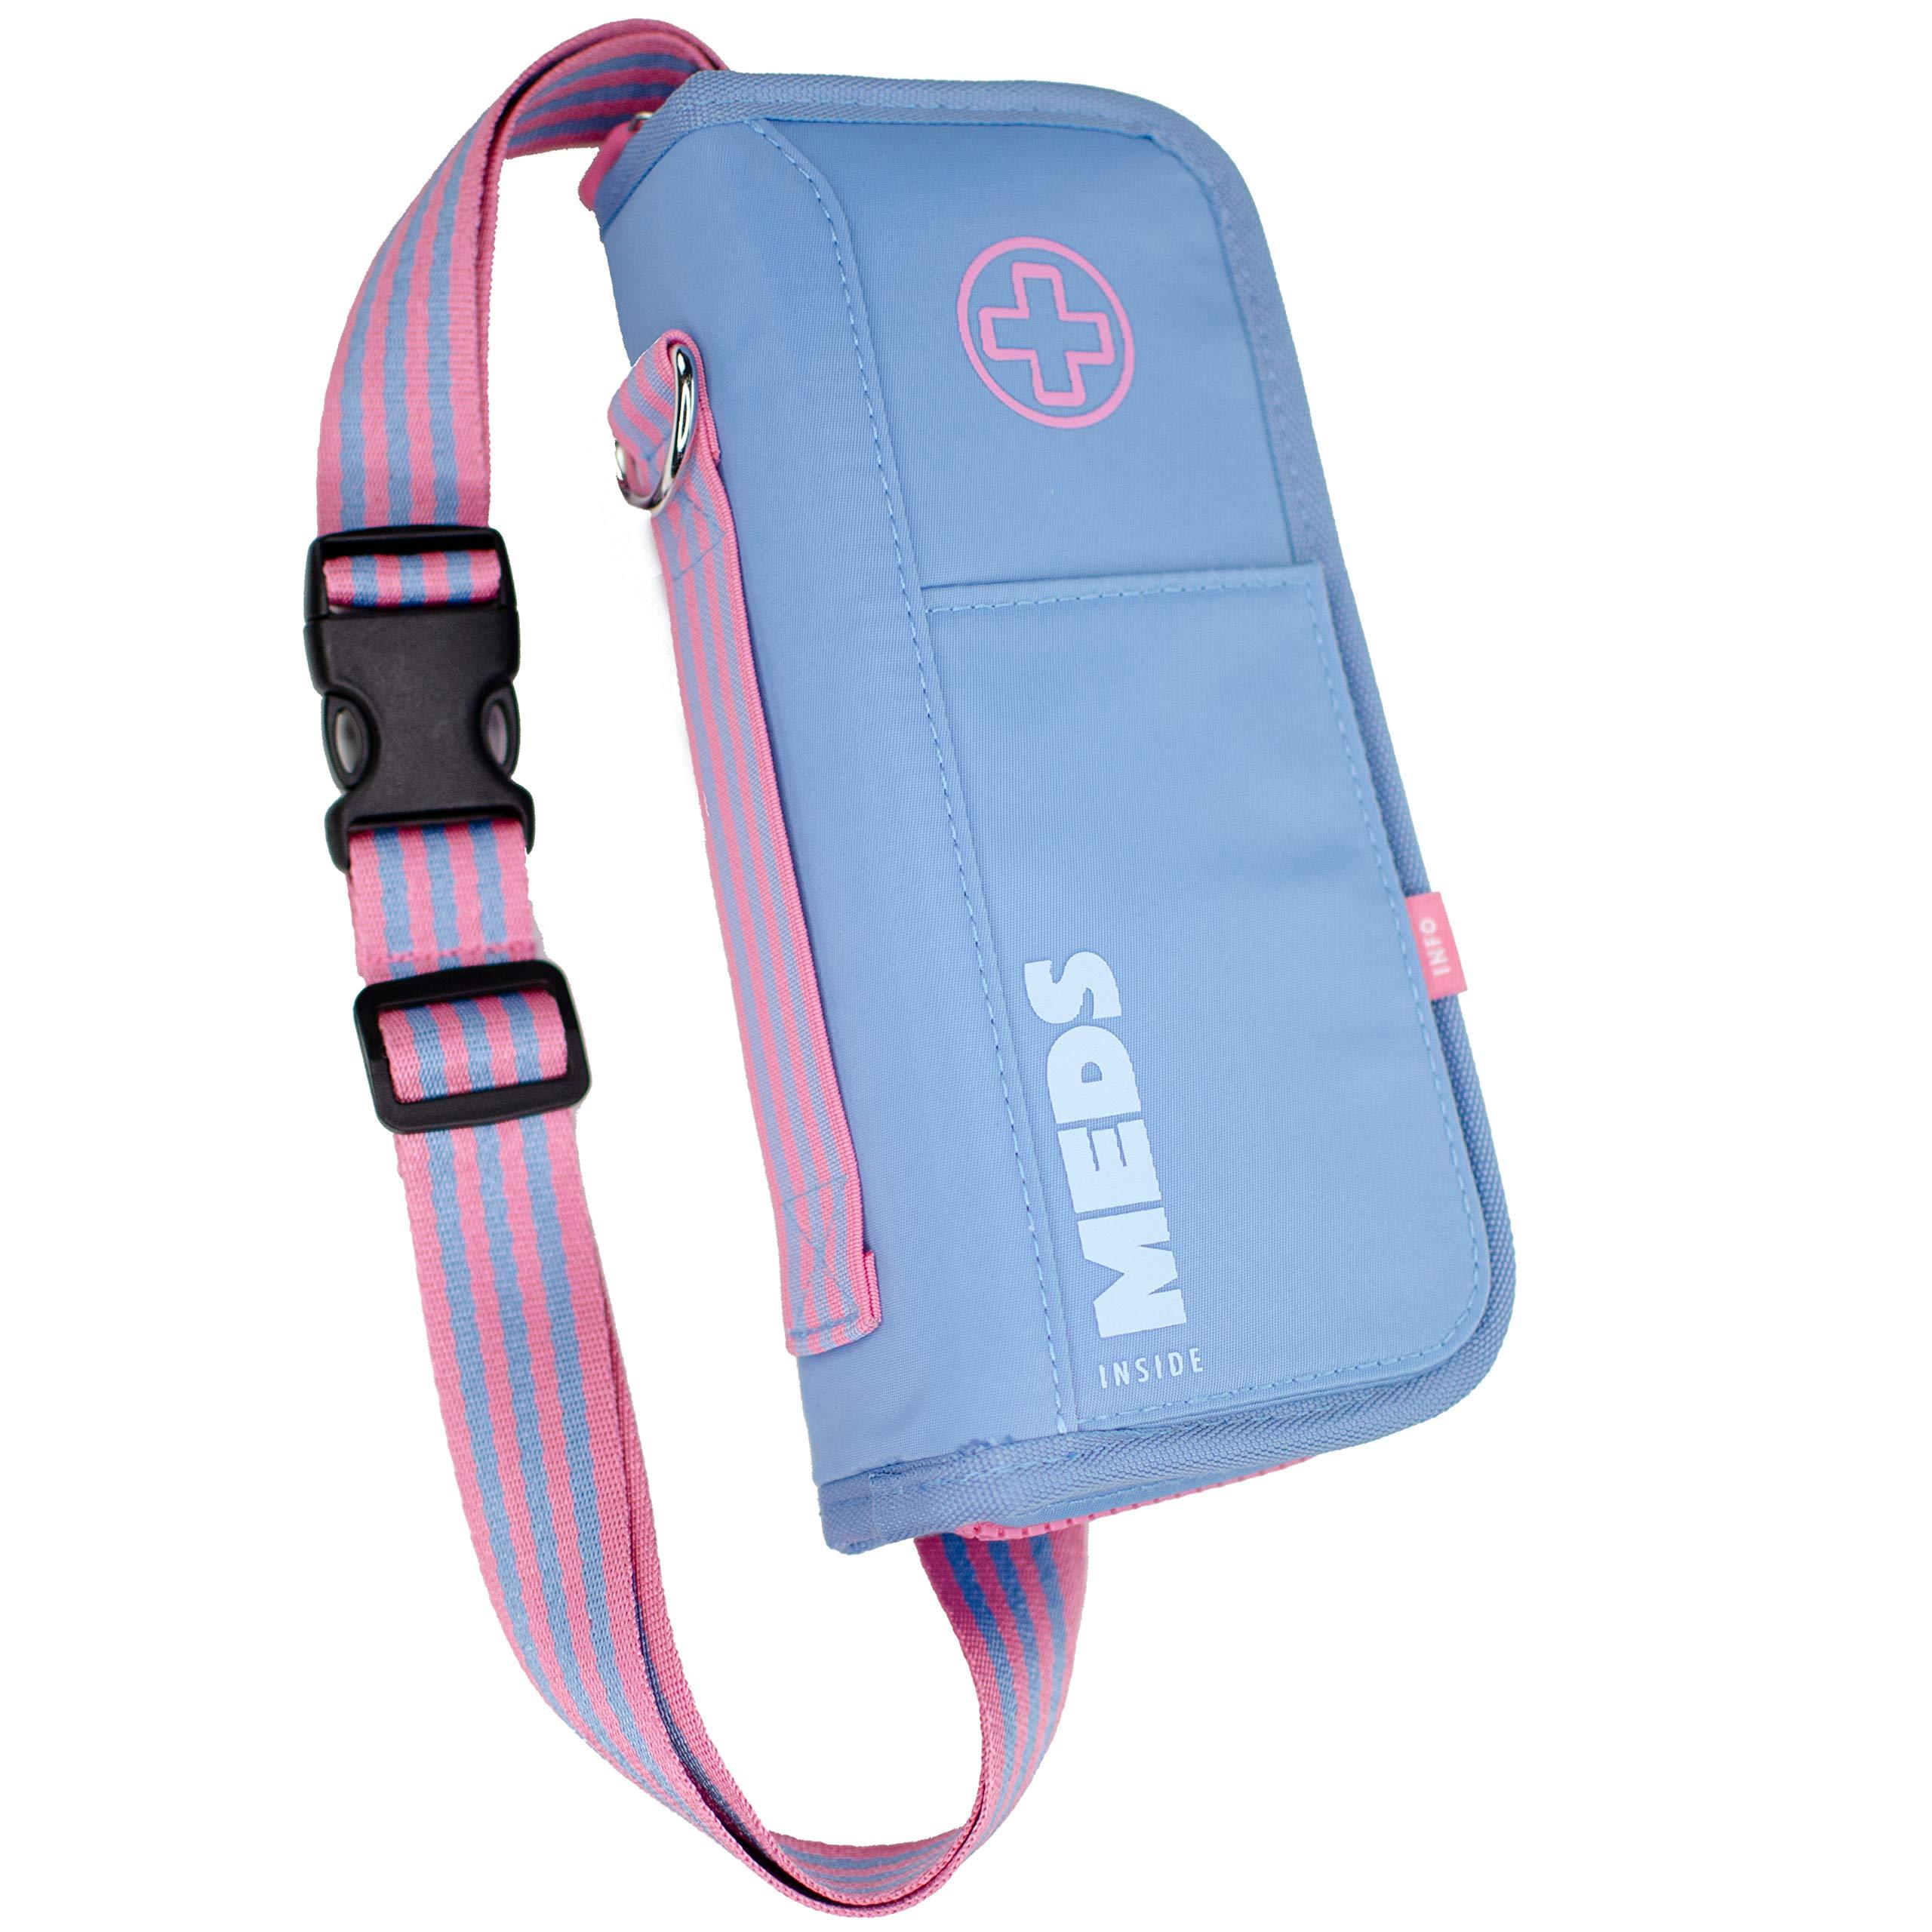 EpiPen Carrying Case for Kids & Adults -''Grace Blue'' Allergy Medical Bag, Epi Pen Fanny Pack - Emergency Medical Carrying Case w/Medicine Bottle Holds:Daily Meds, EpiPens, Inhalers & ID Card